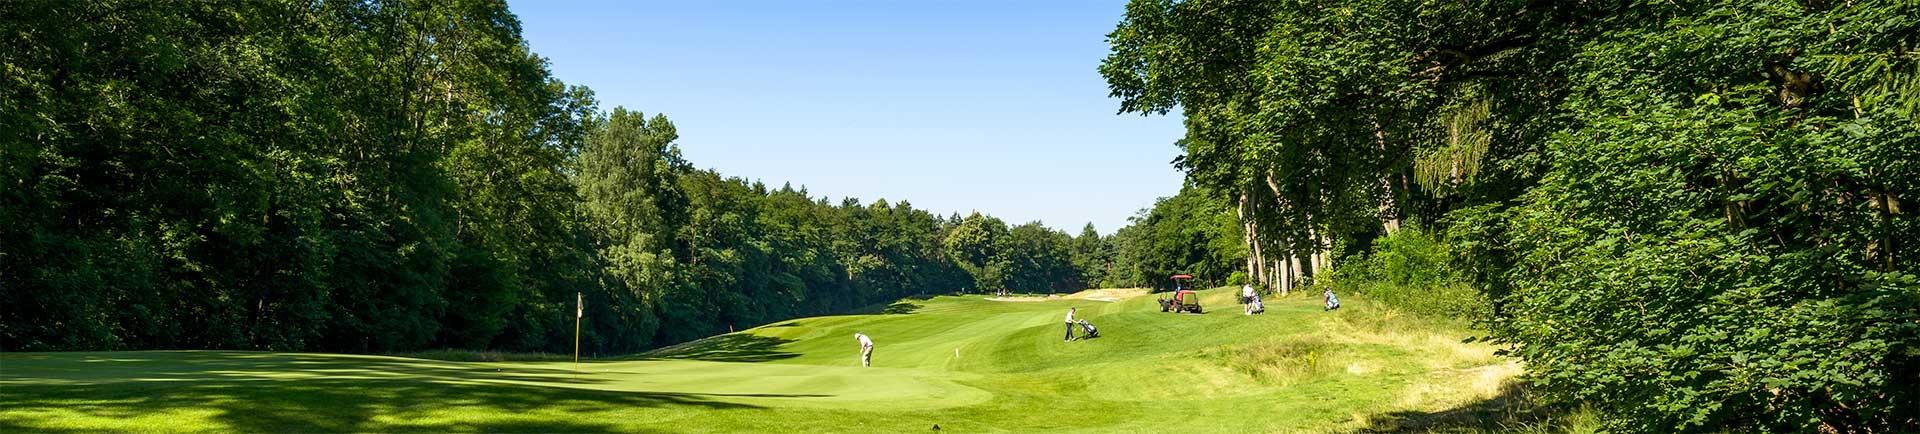 rheinblick-golfcourse-14